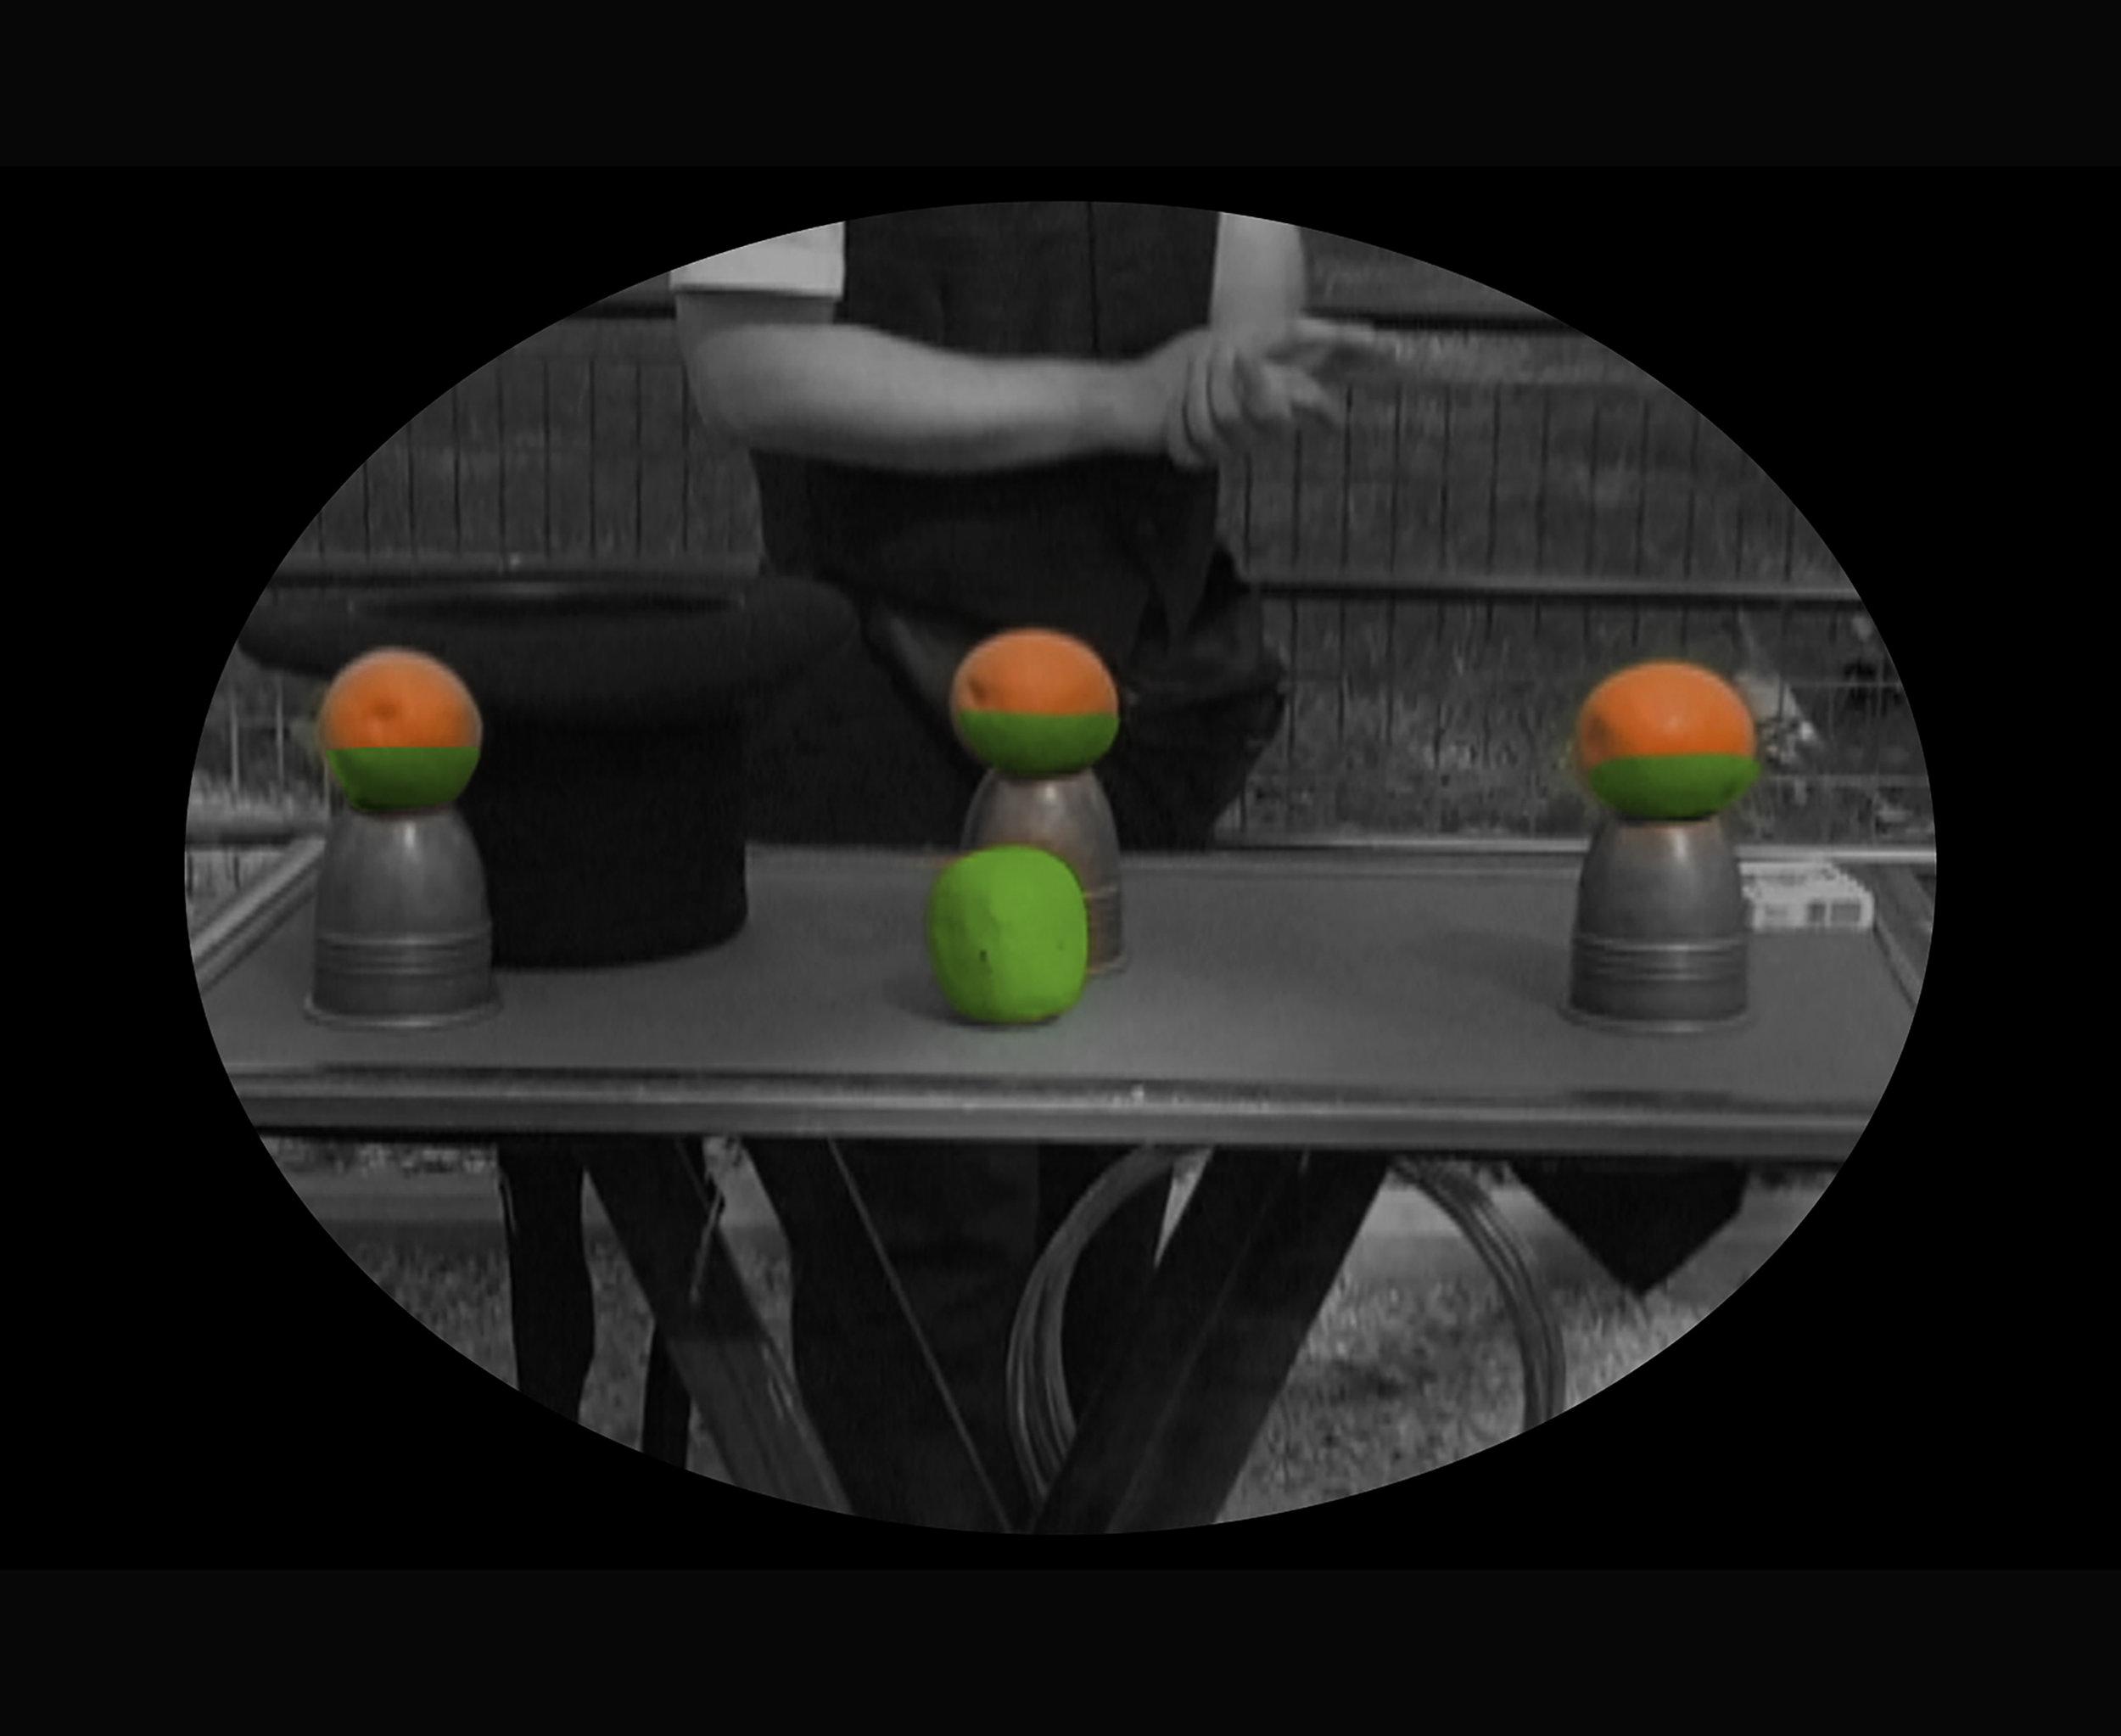 2J_Ashokan Video still magician 1 grn orange-8.jpg